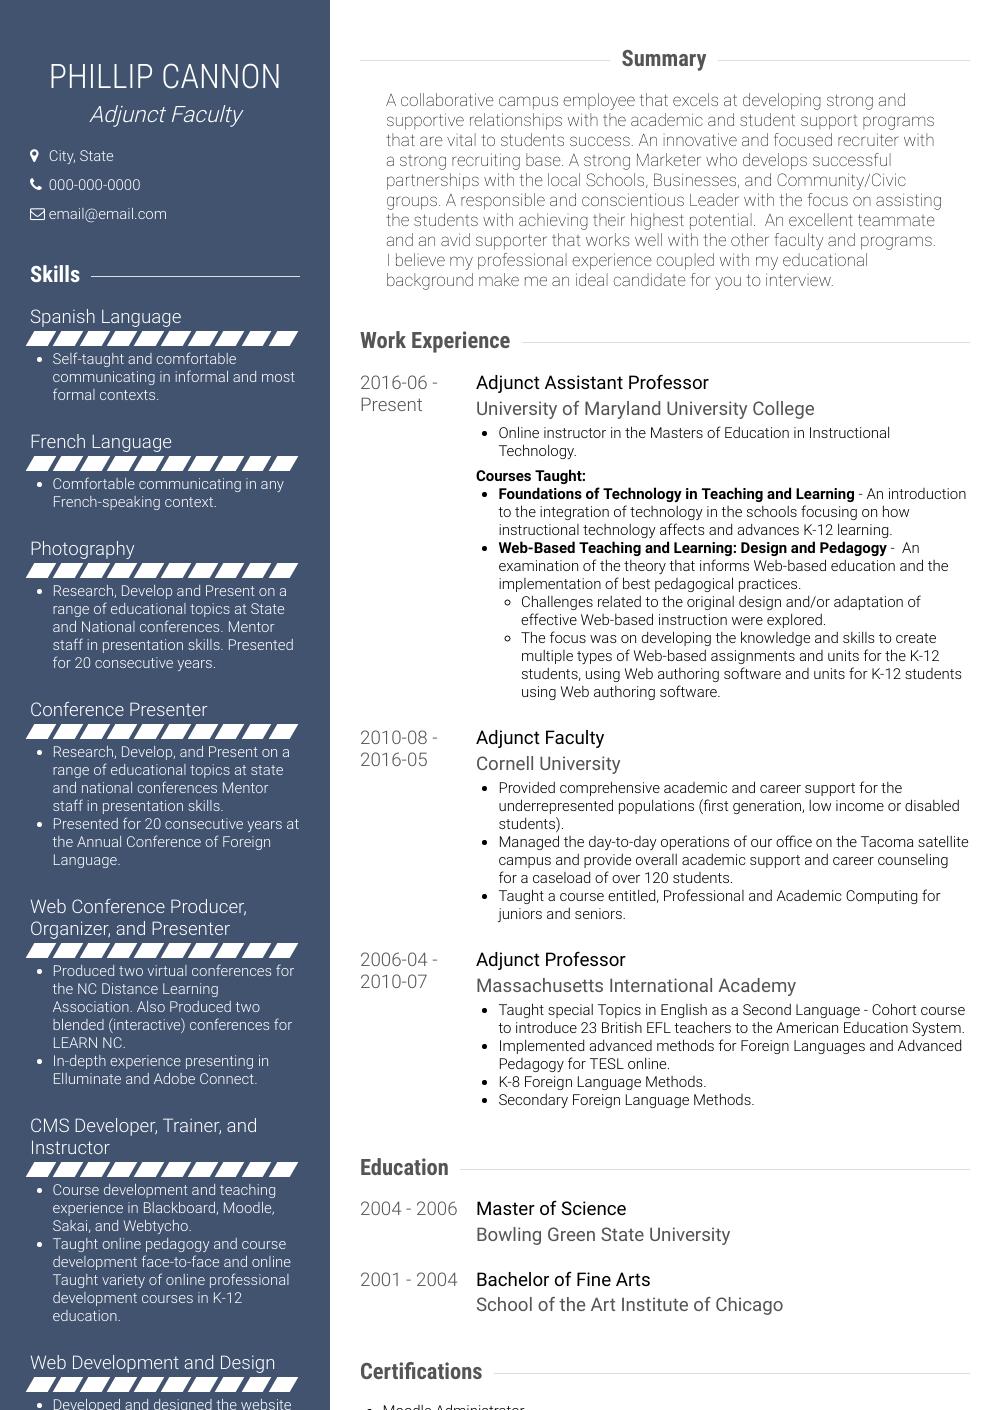 Adjunct Faculty - Resume Samples & Templates | VisualCV